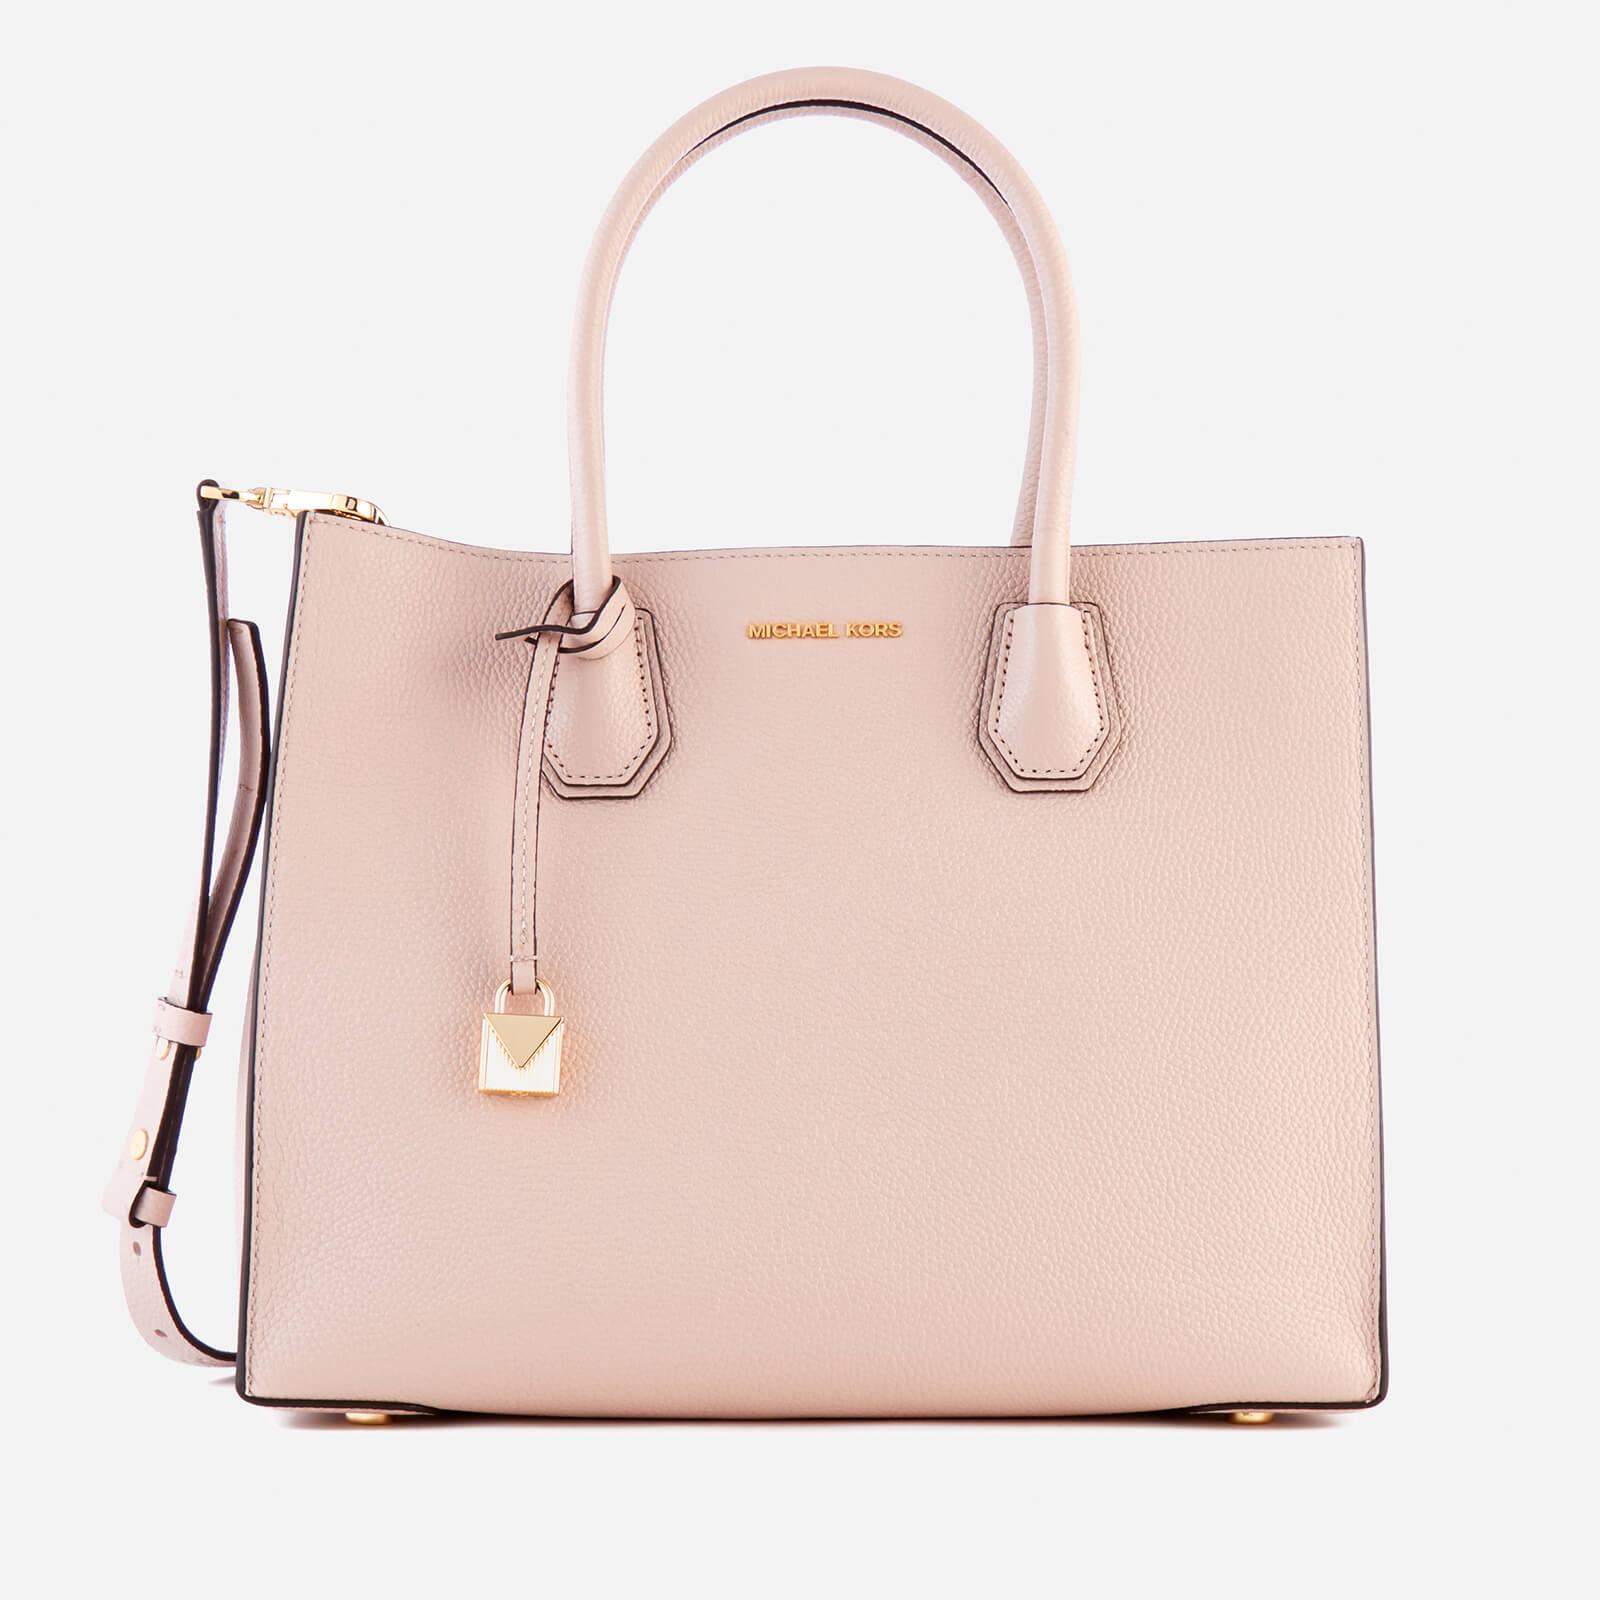 d0b9c92057 MICHAEL MICHAEL KORS Women s Mercer Large Tote Bag - Soft Pink ...